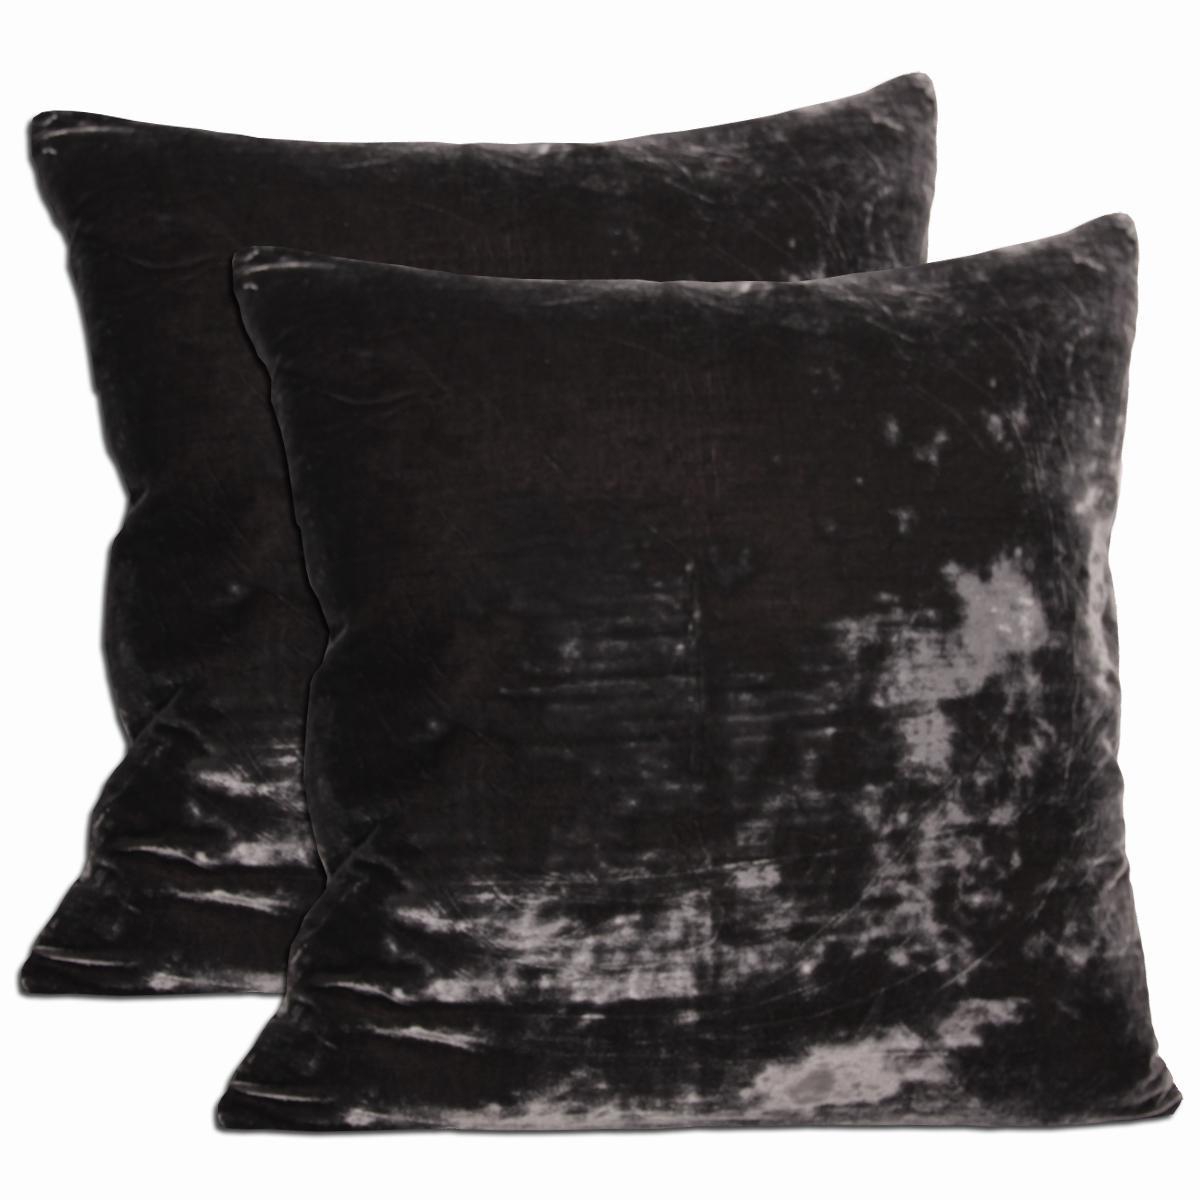 Grey Velvet Throw Pillows (Set of 2)